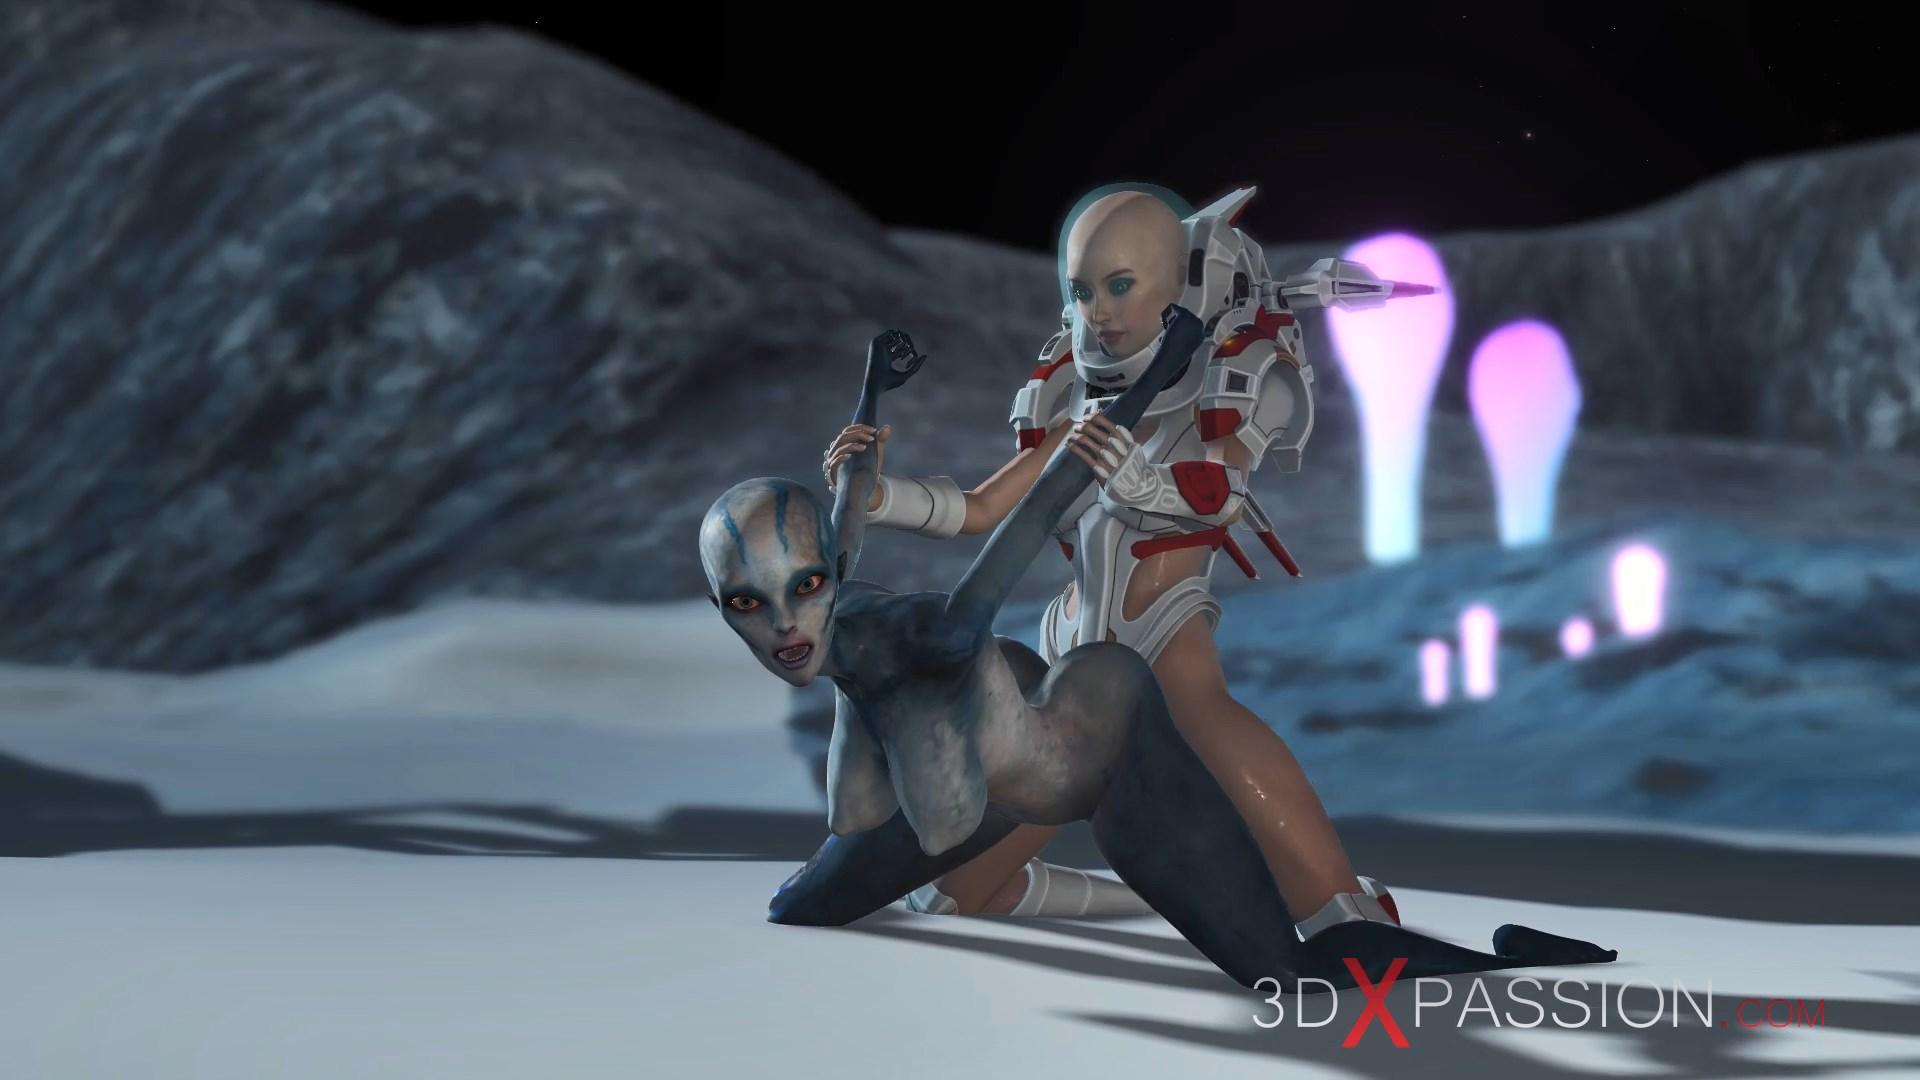 alien fuck doggystyle spacewoman spacesuit strapon exoplanet sci-fi